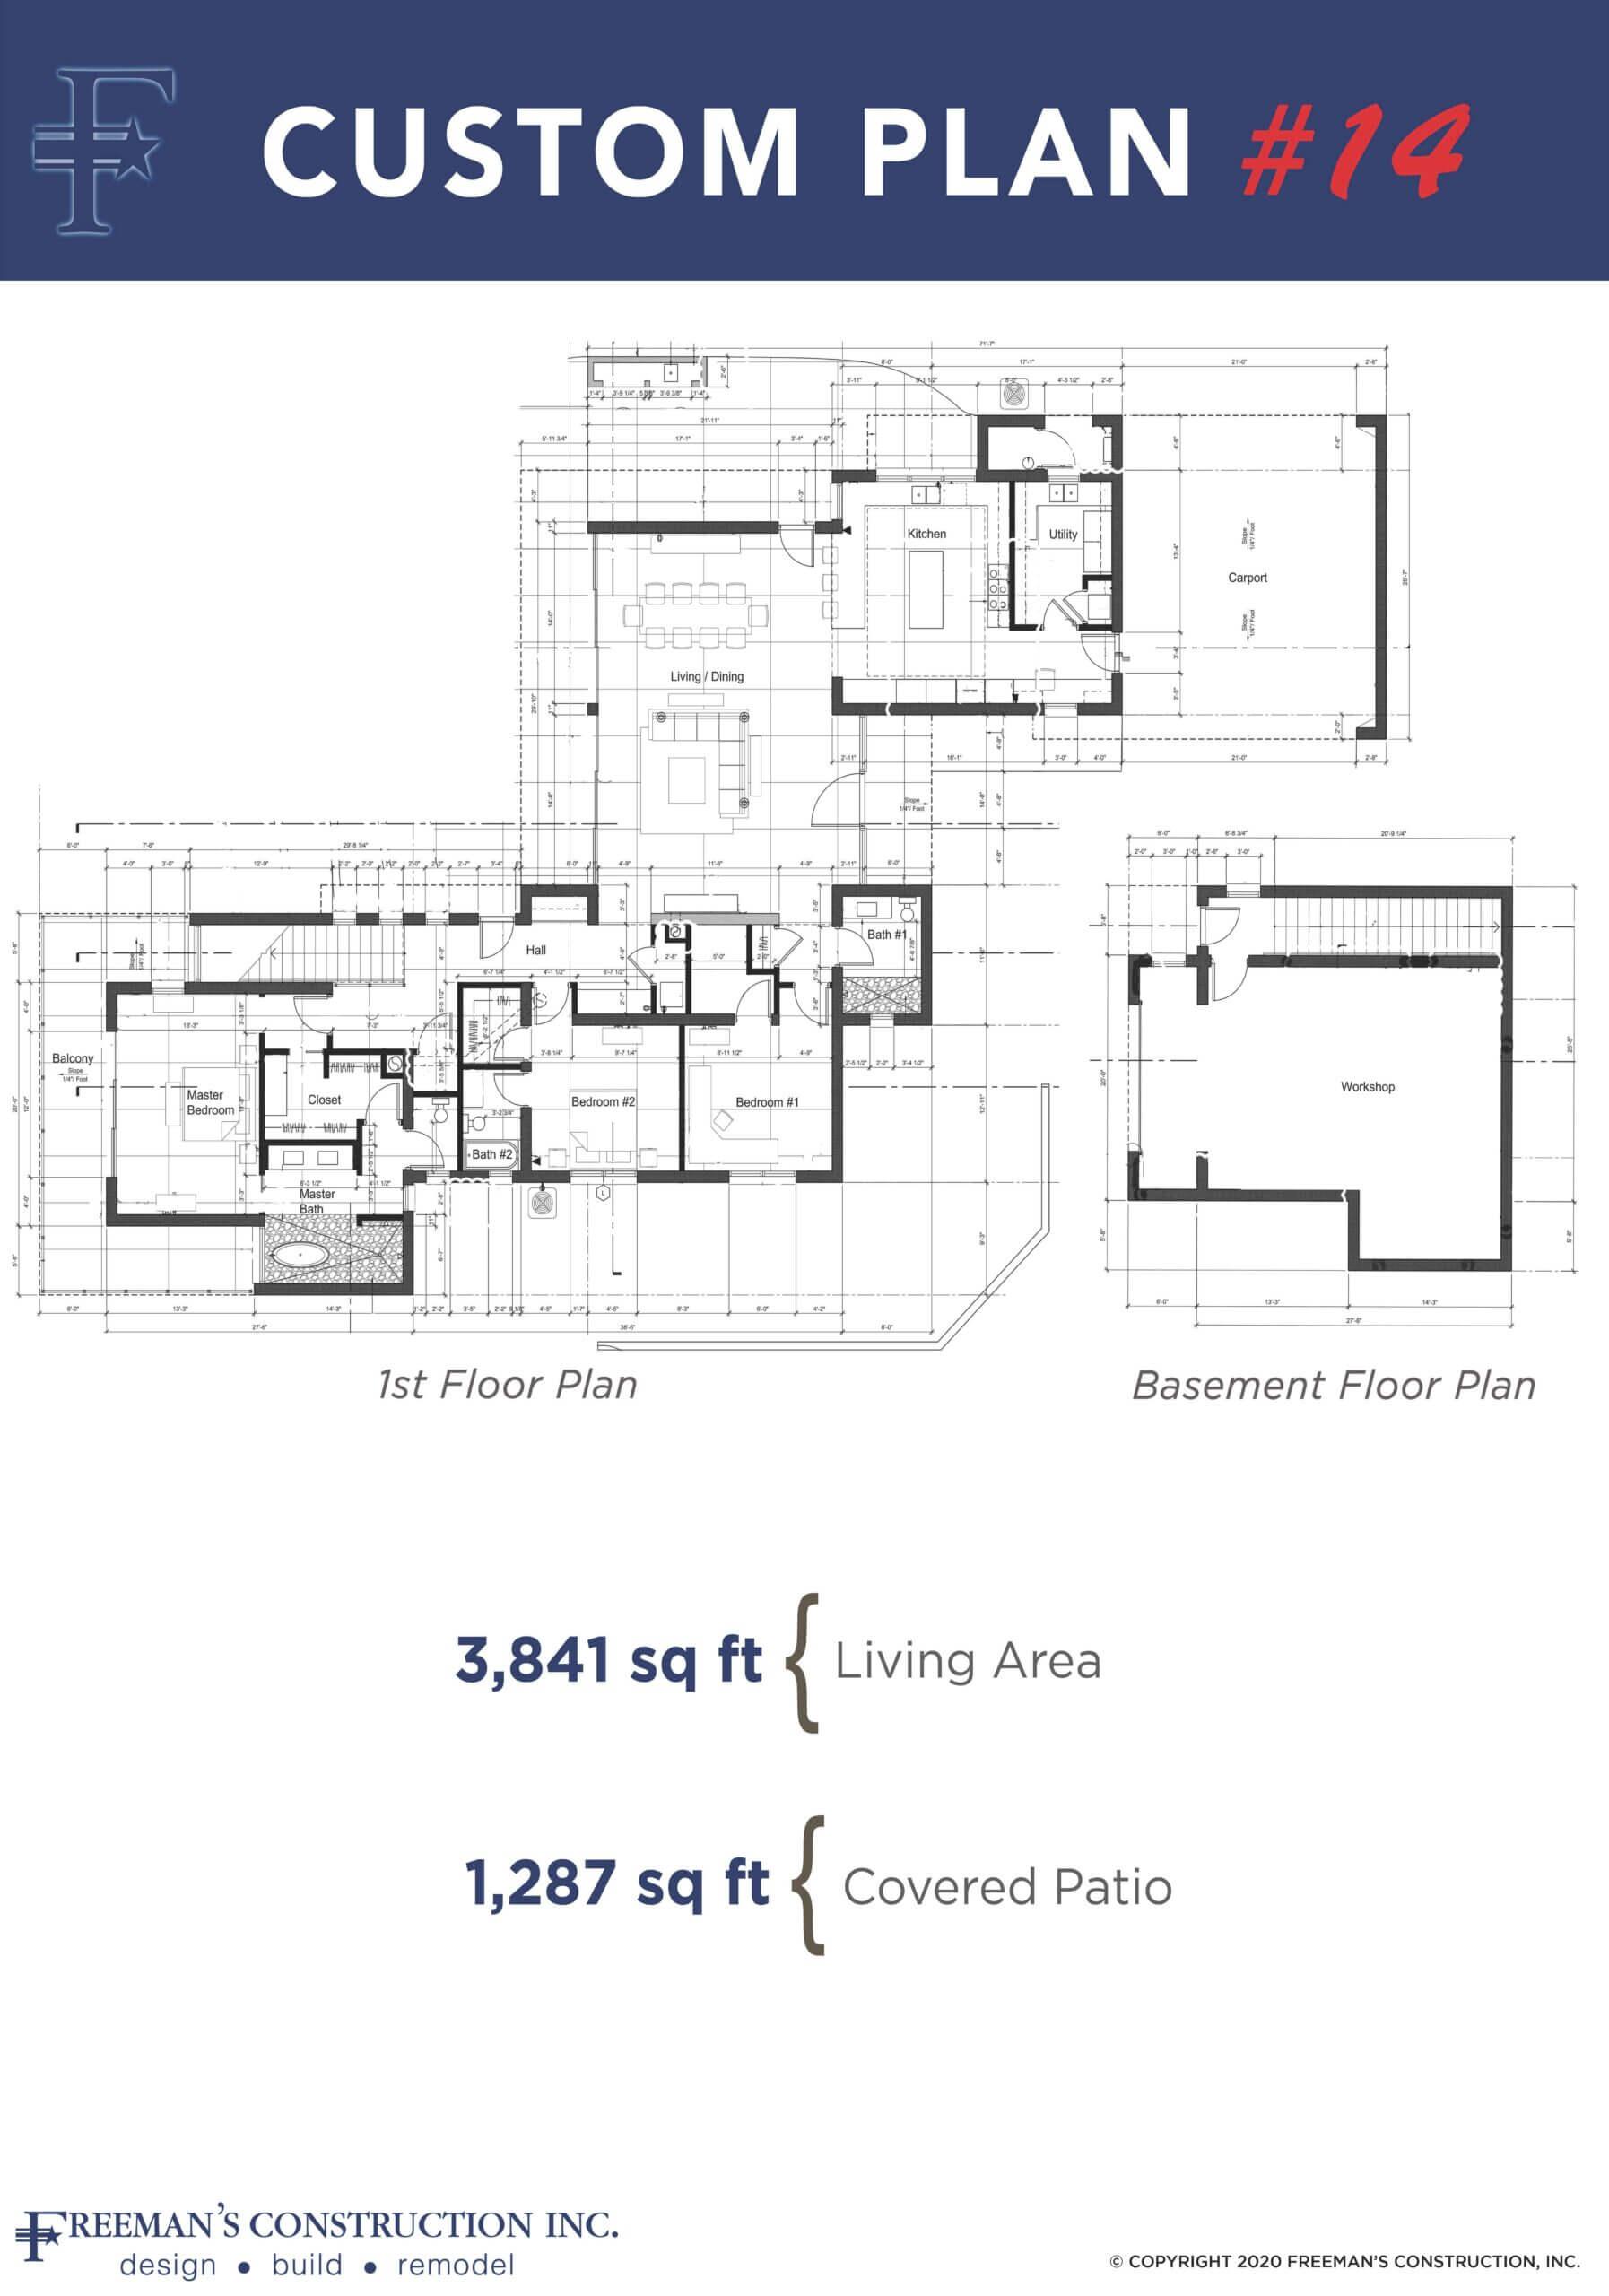 custom-home-floor-plan-14-in-san-diego-county-ca-by-freemans-construction-inc